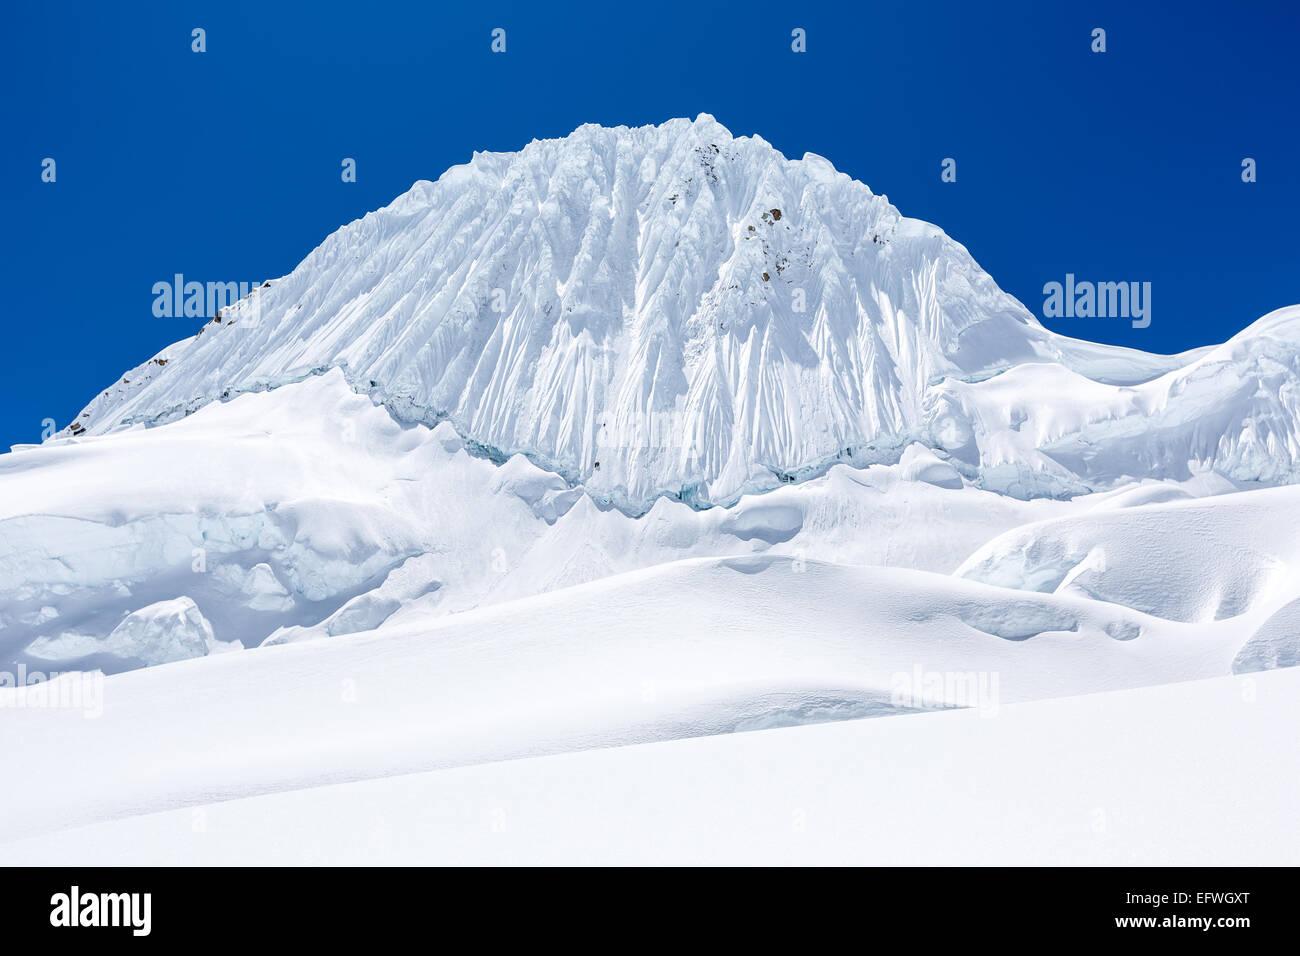 Four climbers descending from Alpamayo mountain, Santa Cruz valley, Cordillera Blanca, Andes, Peru, South America - Stock Image